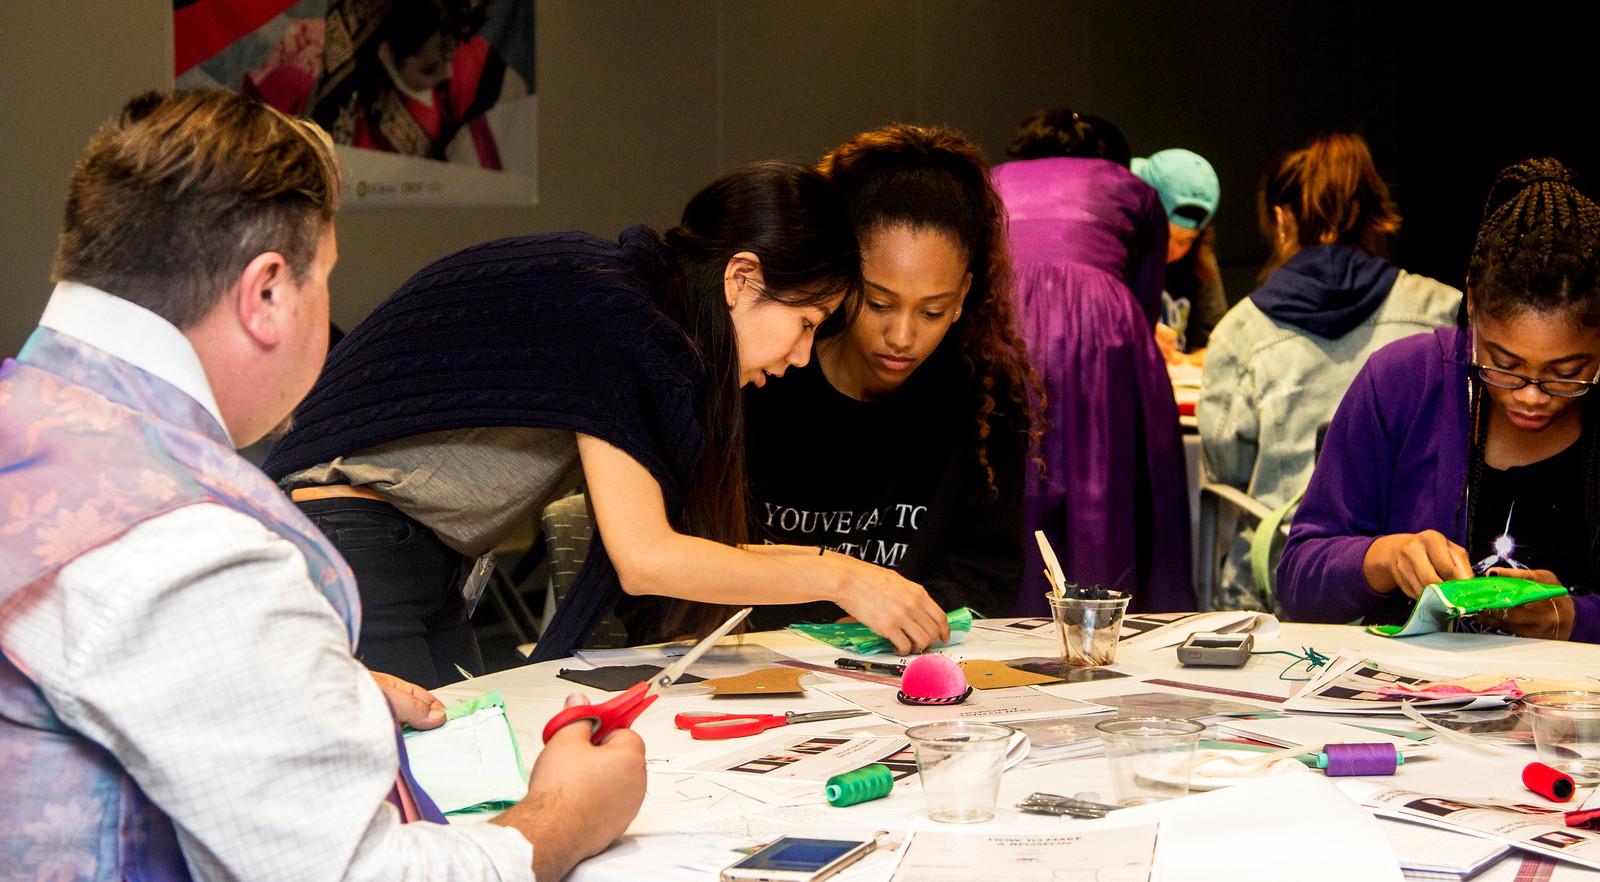 Summer Program - Theatre Arts   LMU Pre-College Programs: Design for Stage and Screen